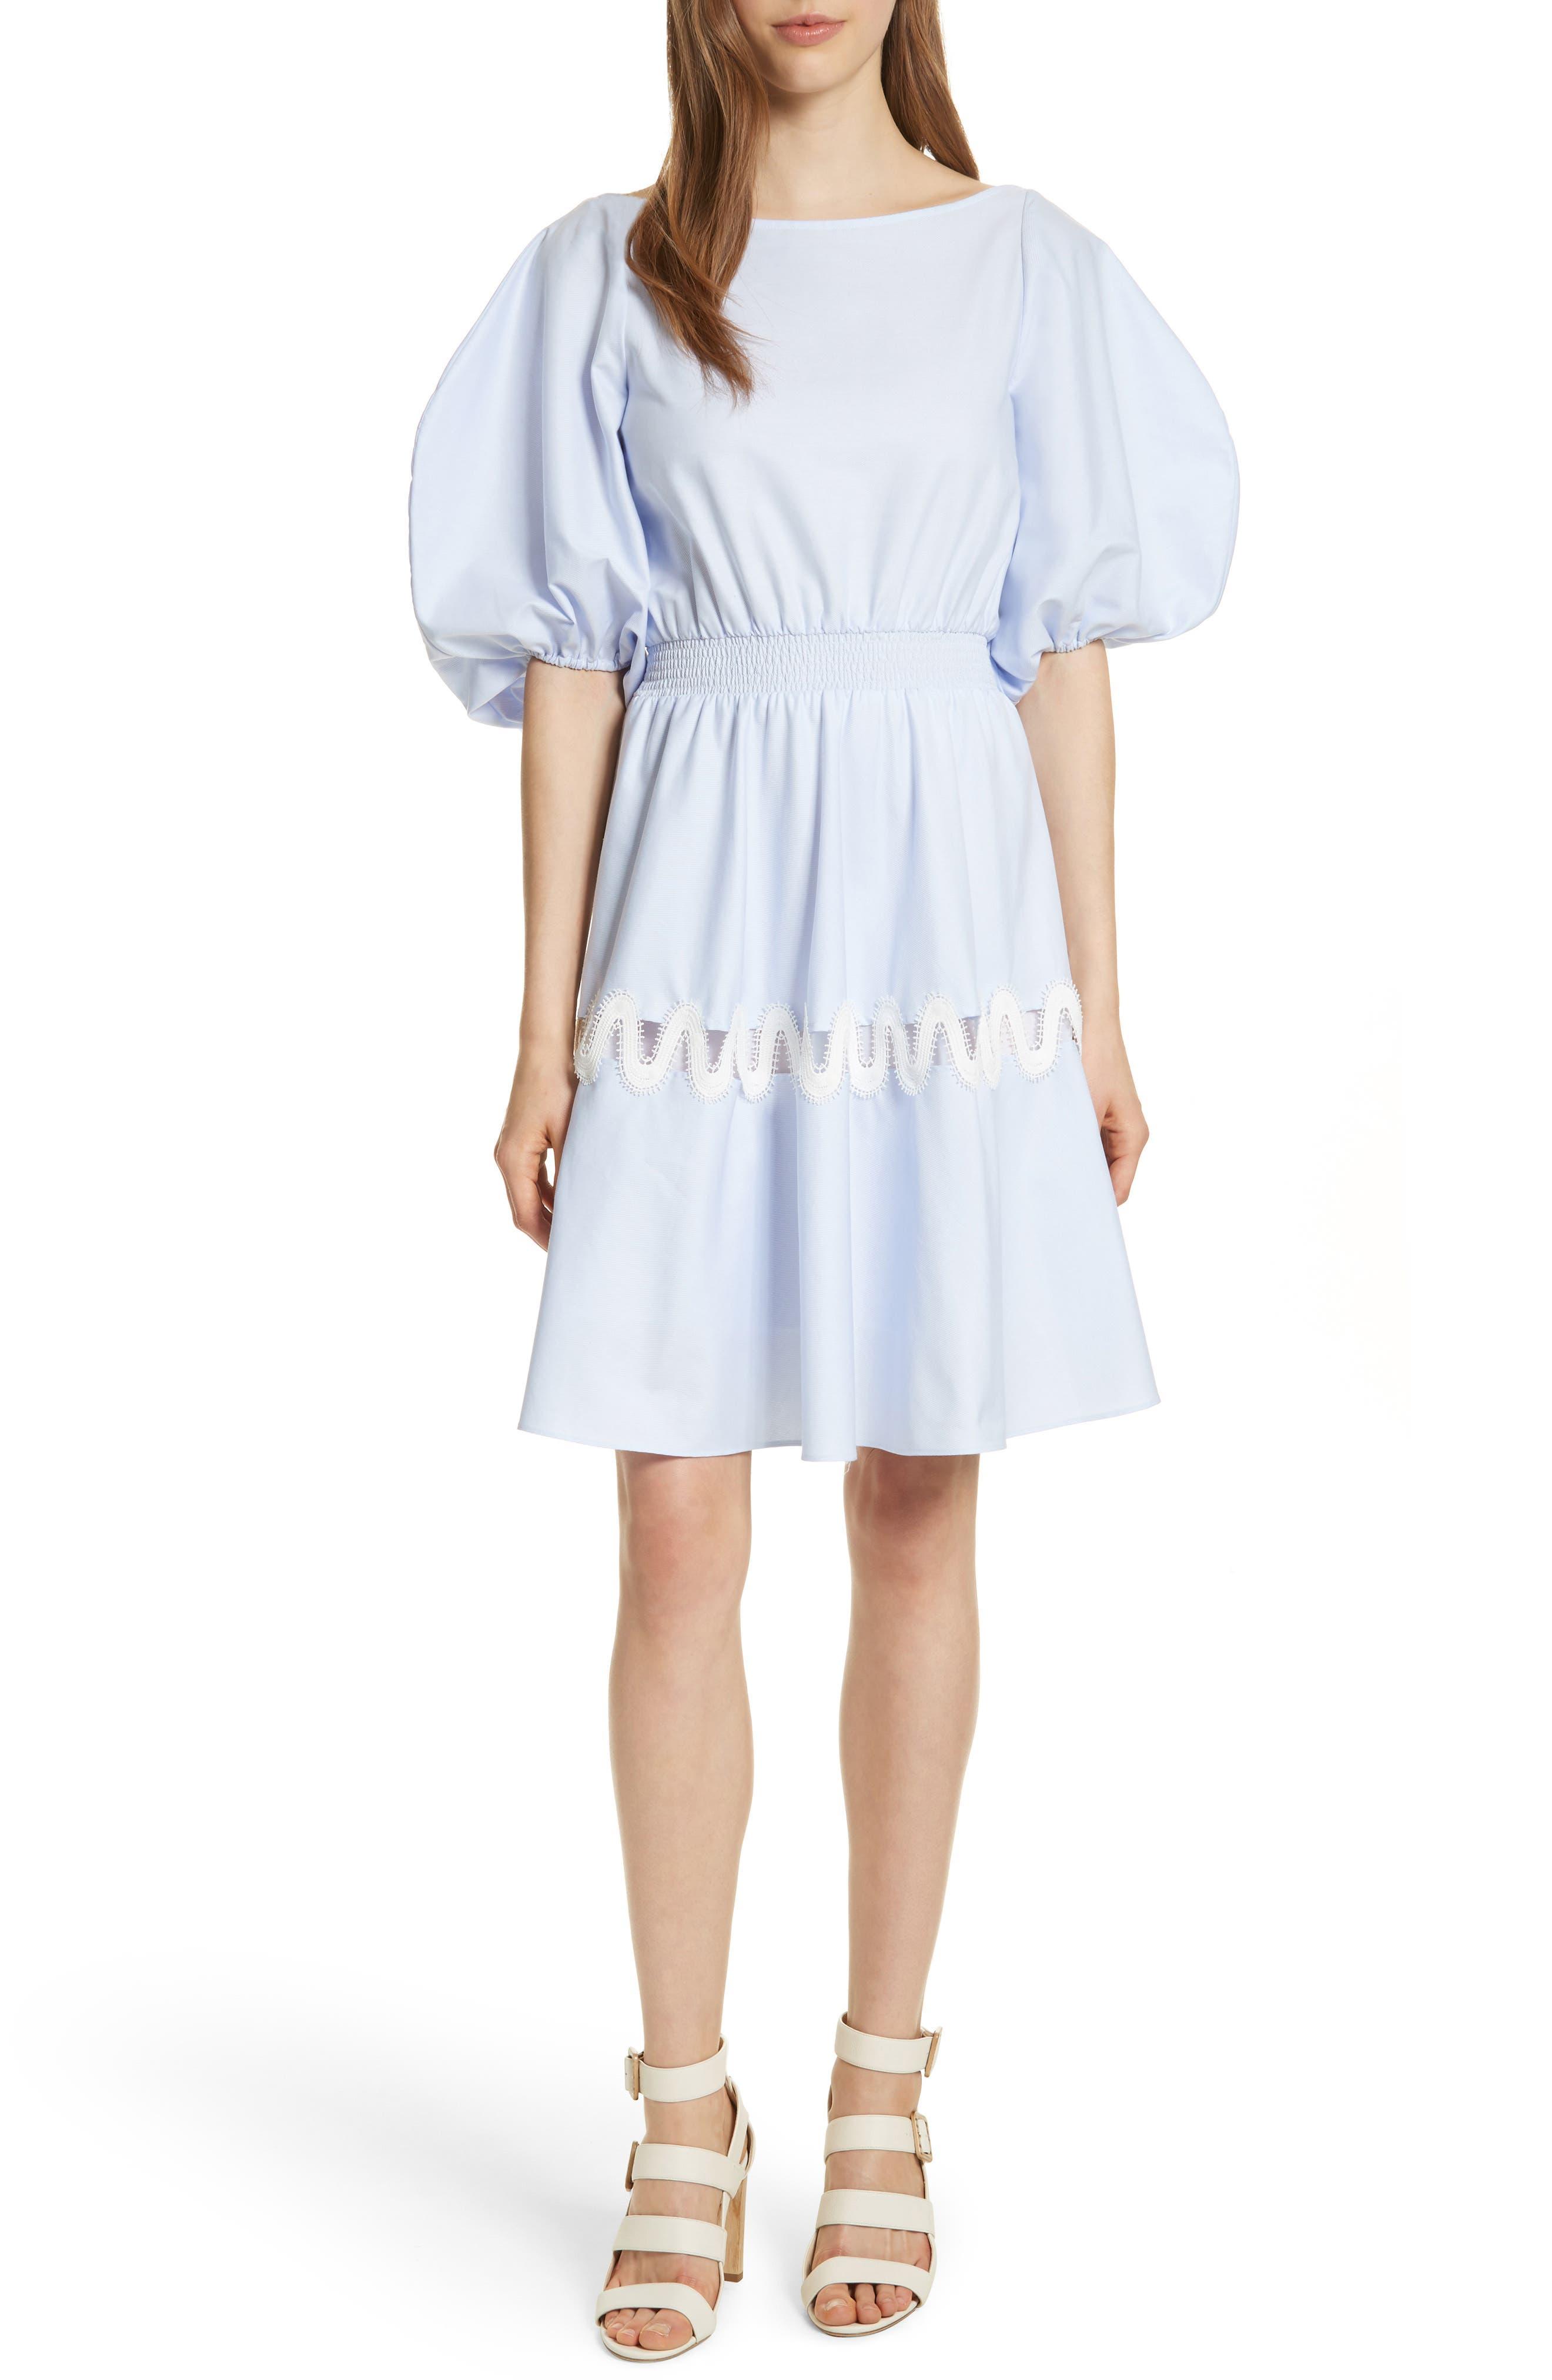 Prose & Poetry Charleene Cotton Balloon Sleeve Dress,                         Main,                         color, 420